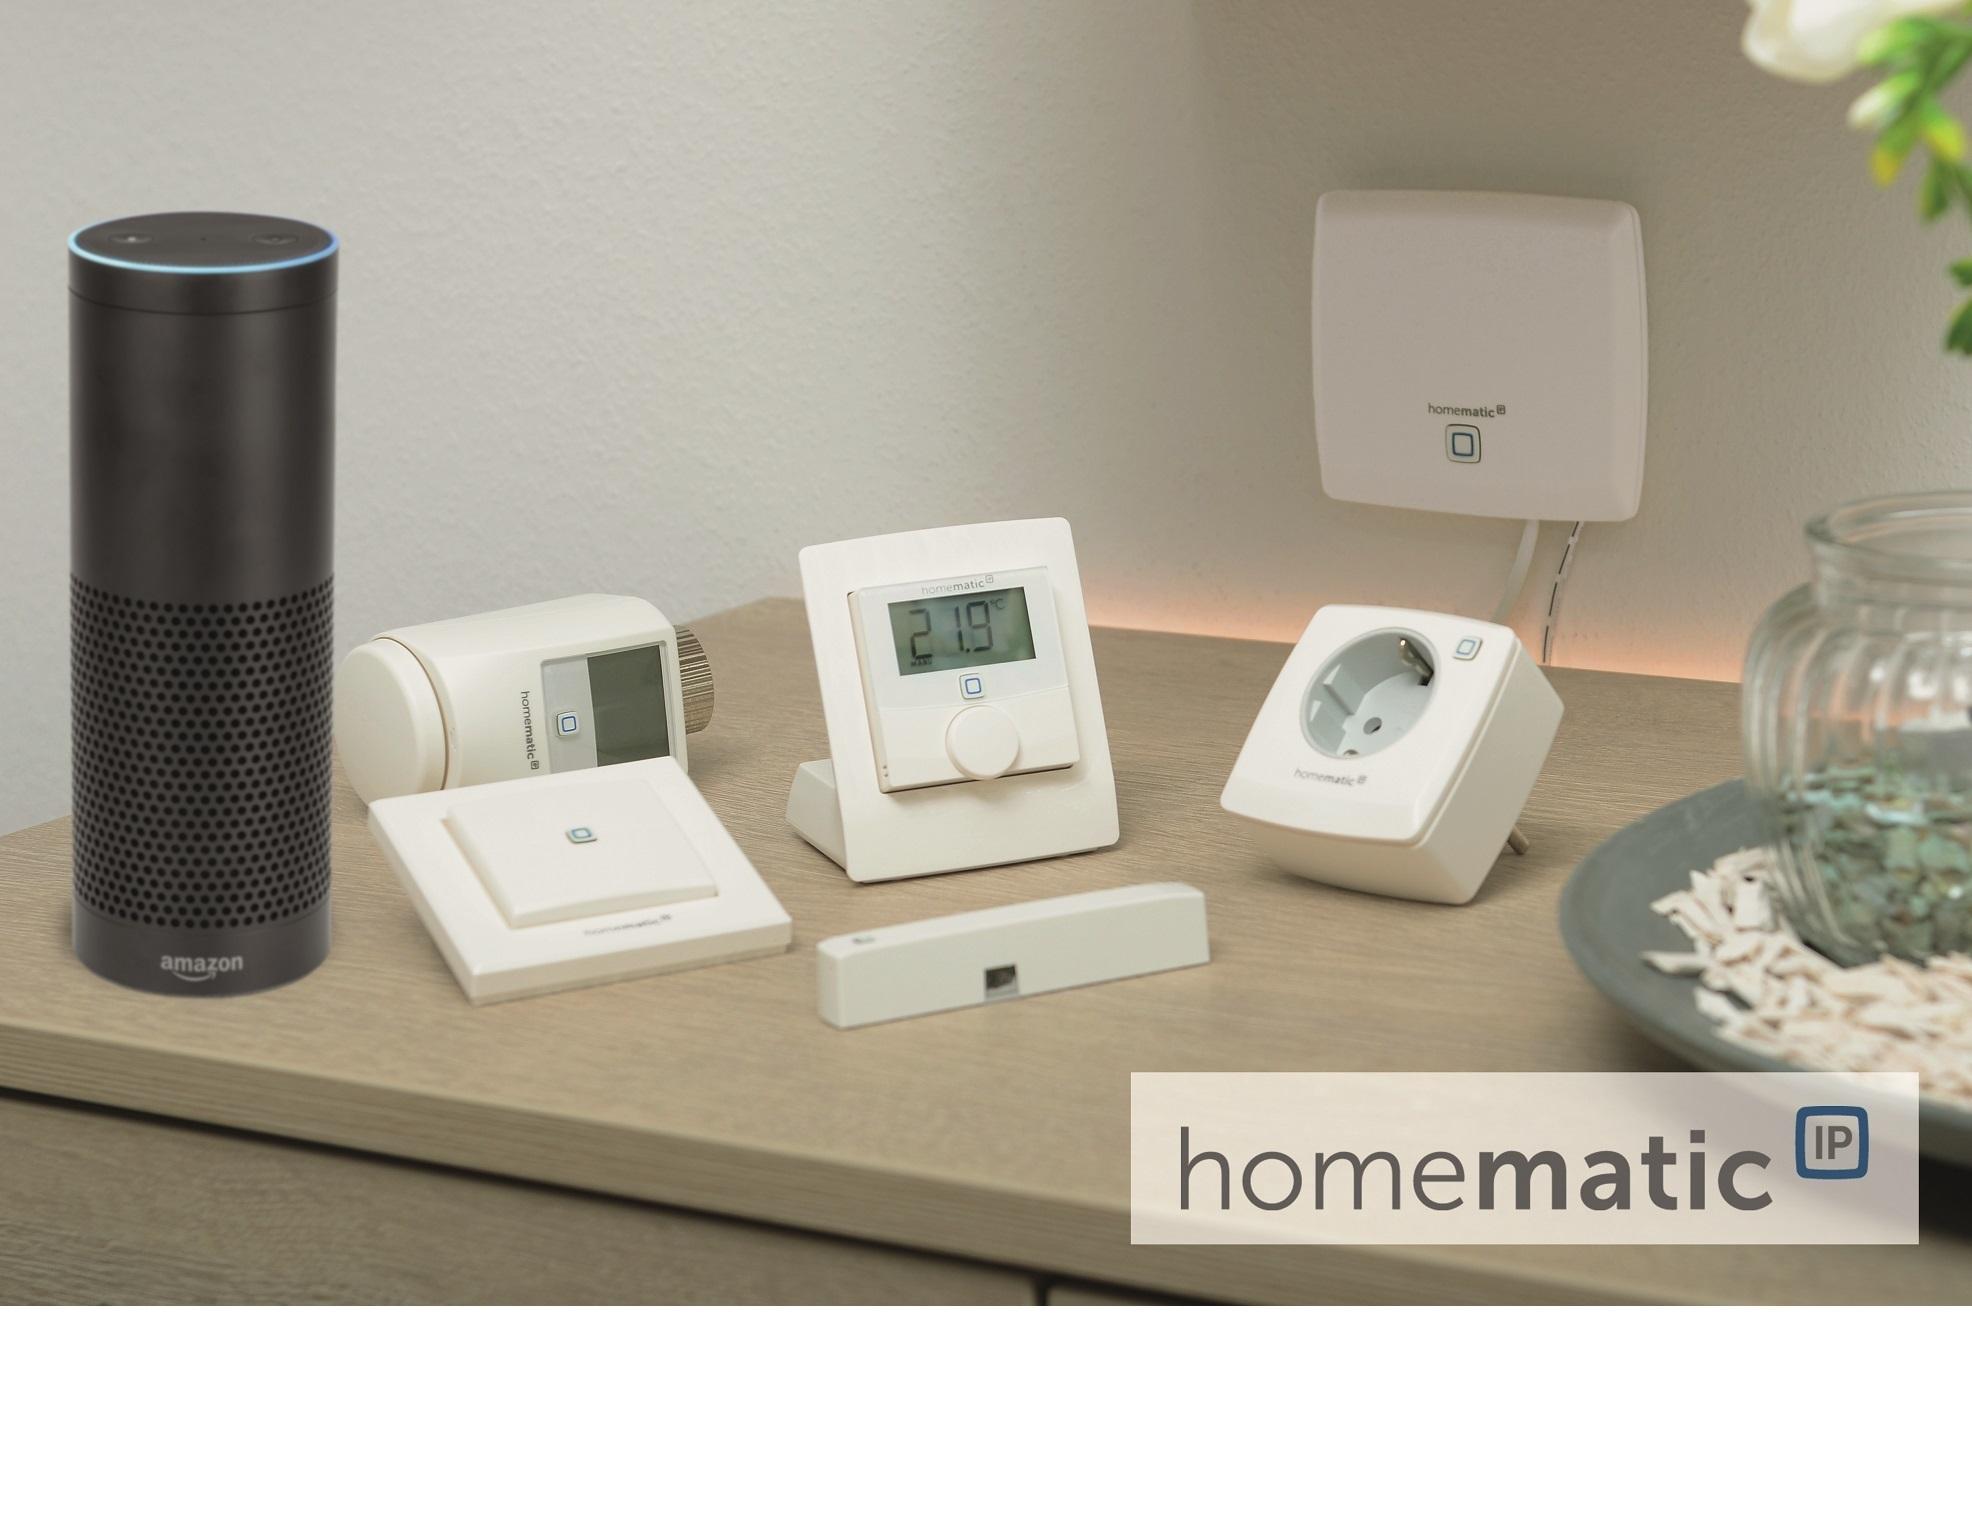 homematic ip mit amazon alexa steuern. Black Bedroom Furniture Sets. Home Design Ideas